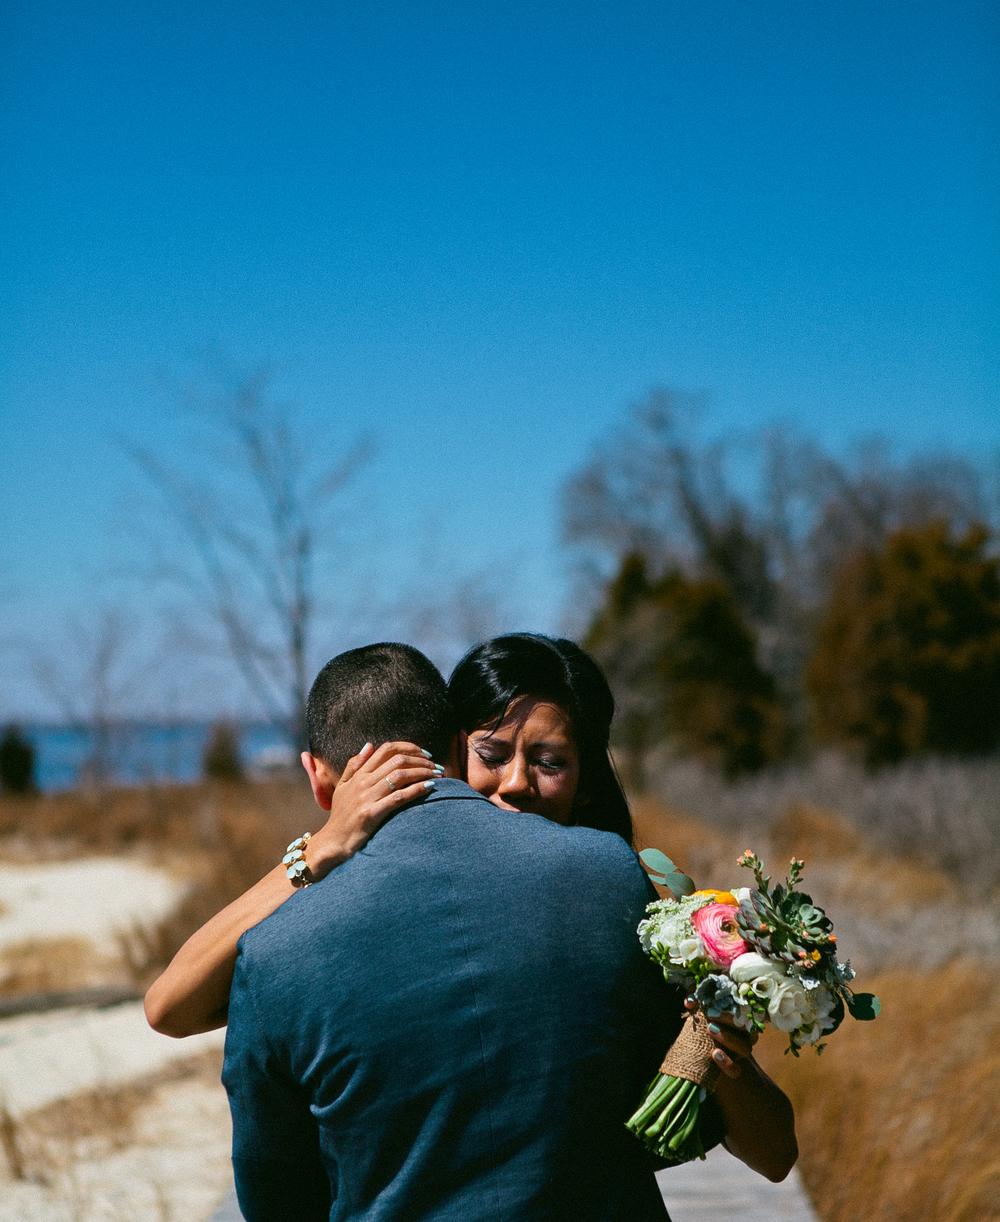 ica_images_tim_wedding_bay_im_kristen_DIY_maryland_photography30of218.jpg~original.jpeg